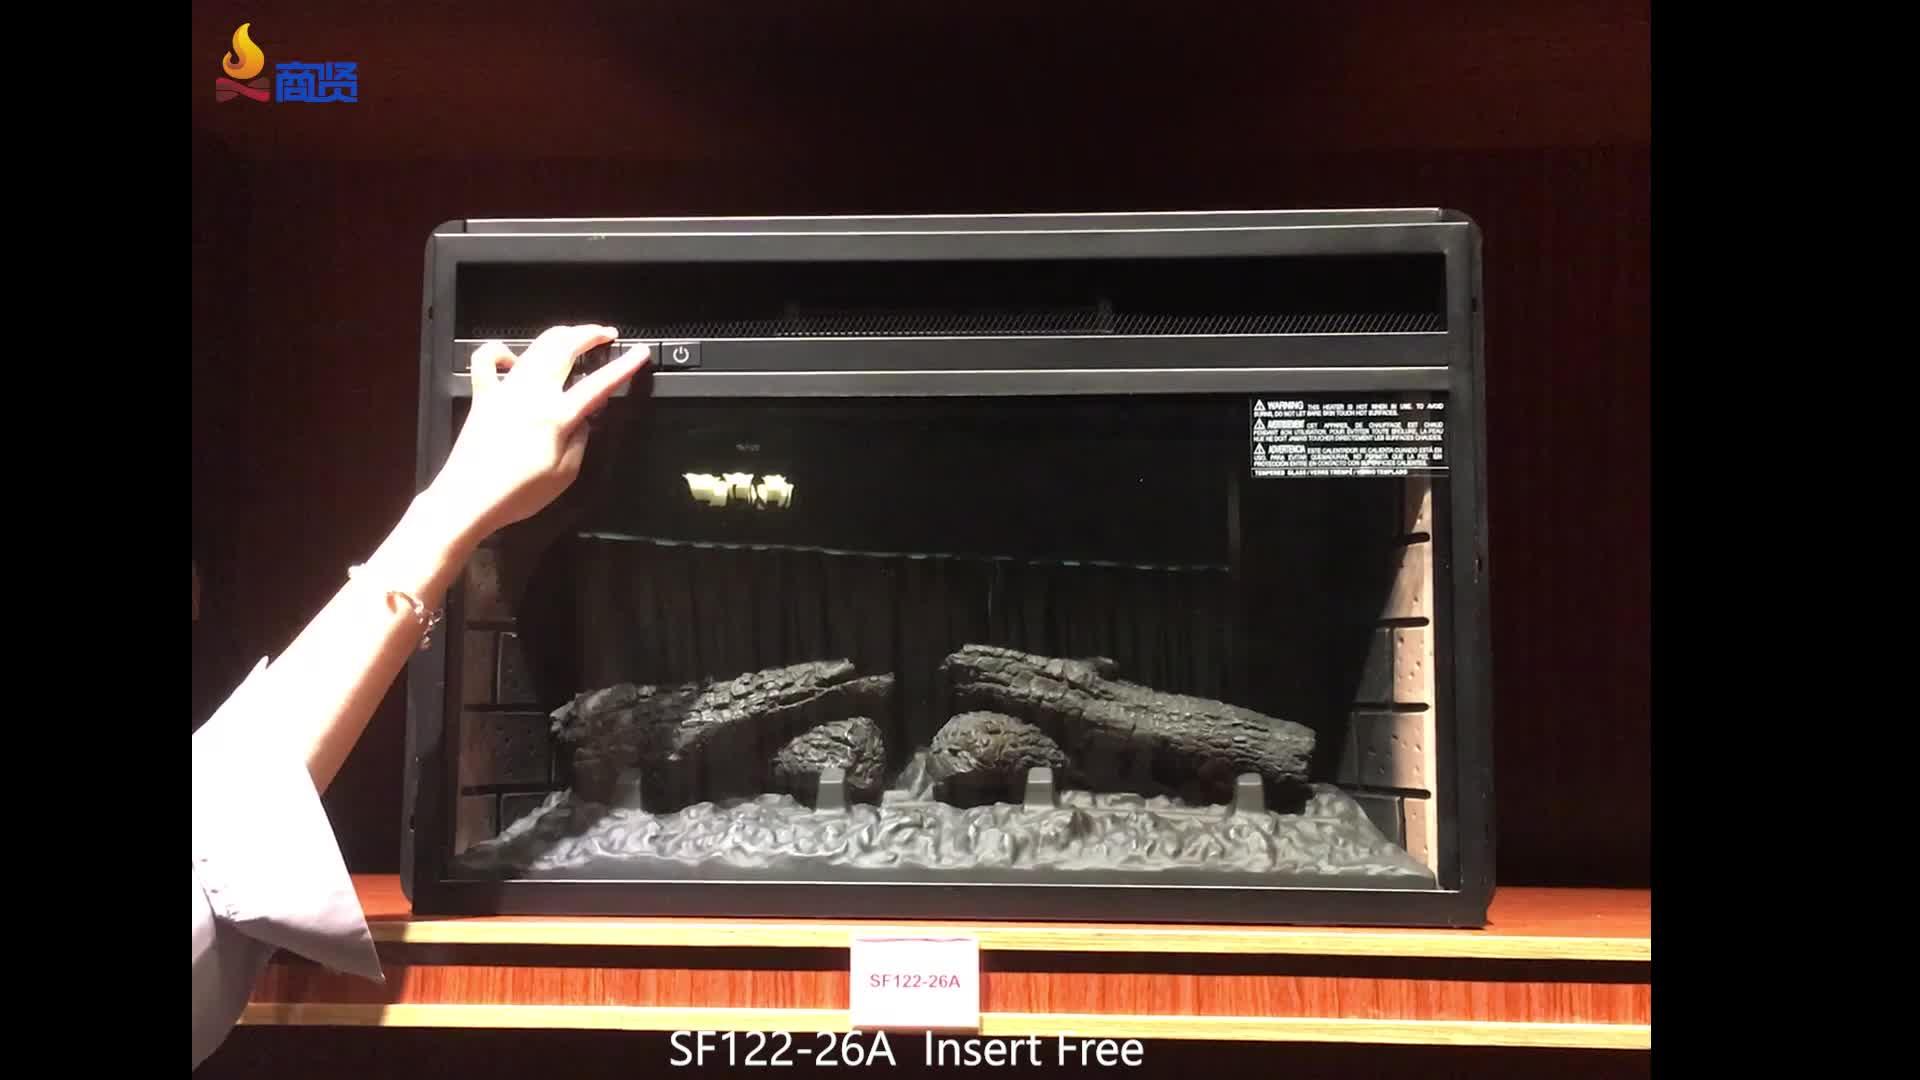 Dekor alev tv standı ile elektrikli şömine eklemek elektrikli şömine